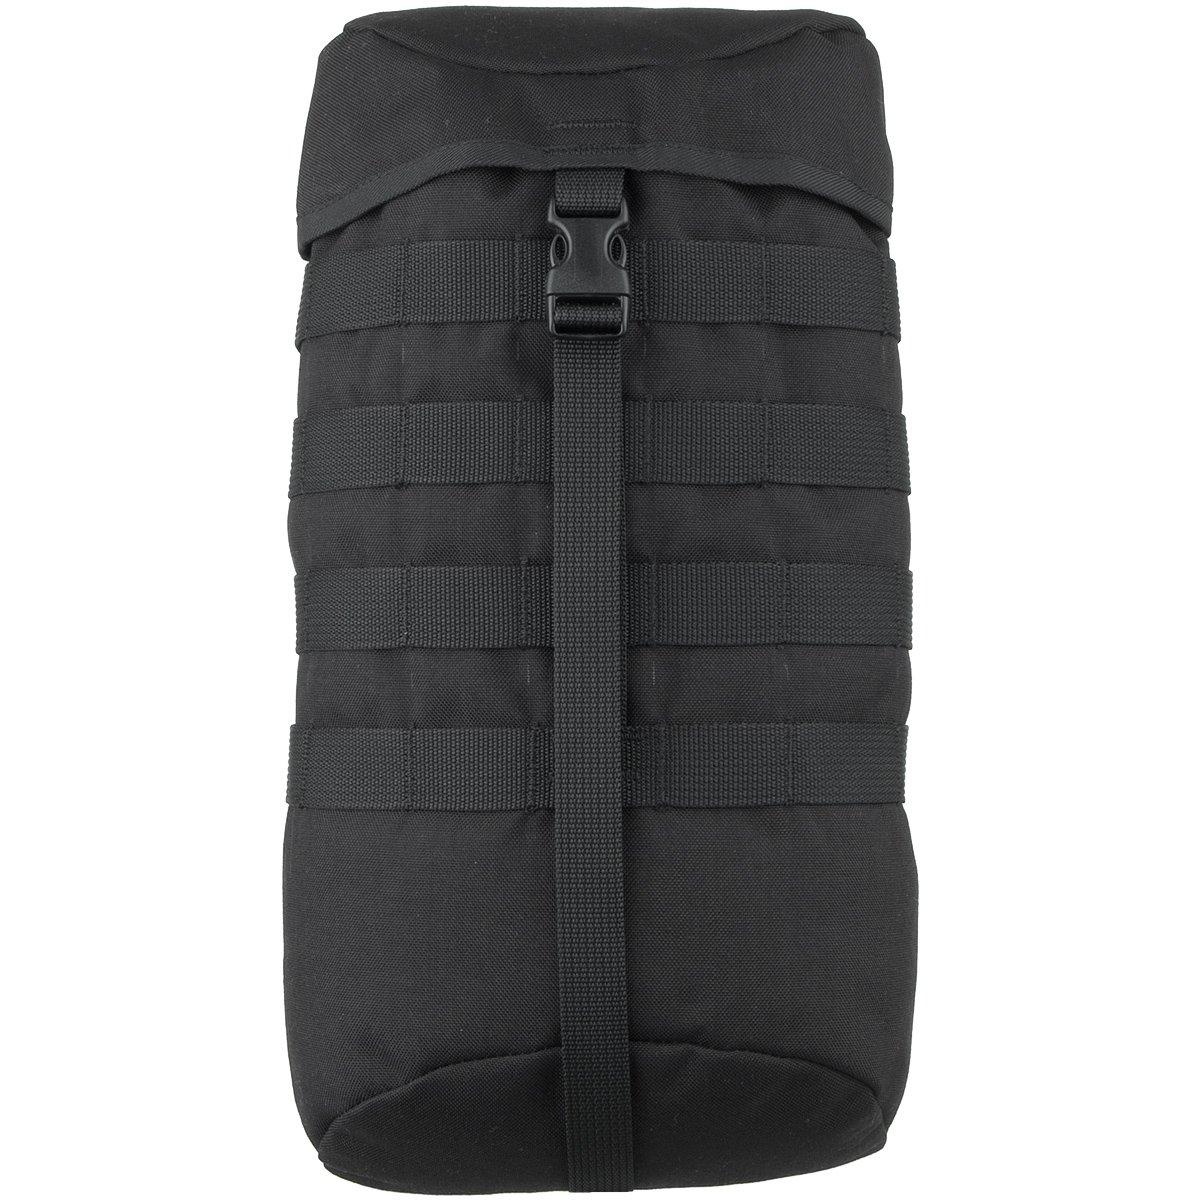 Wisport Raccoon ポケット ブラック   B012XK4J7O